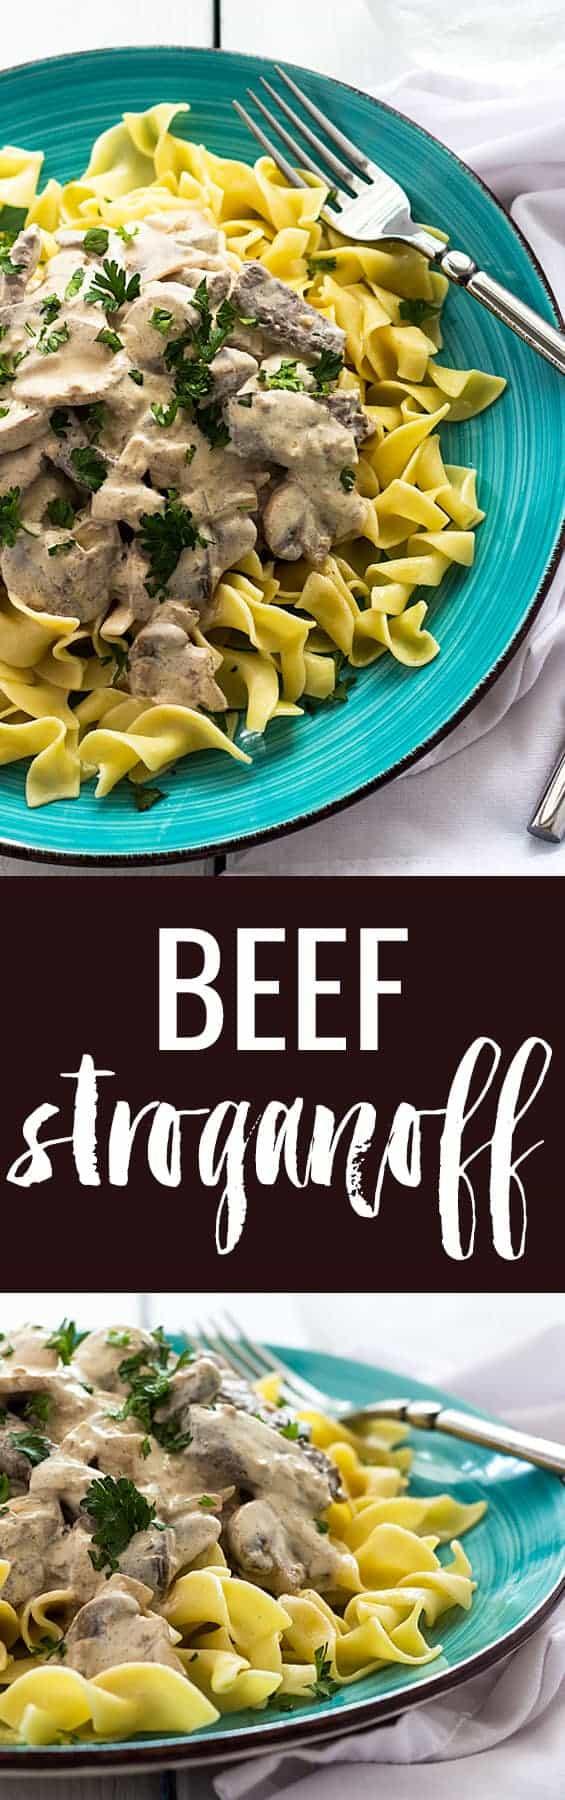 Beef Stroganoff - The ultimate comfort food in just 30 minutes!